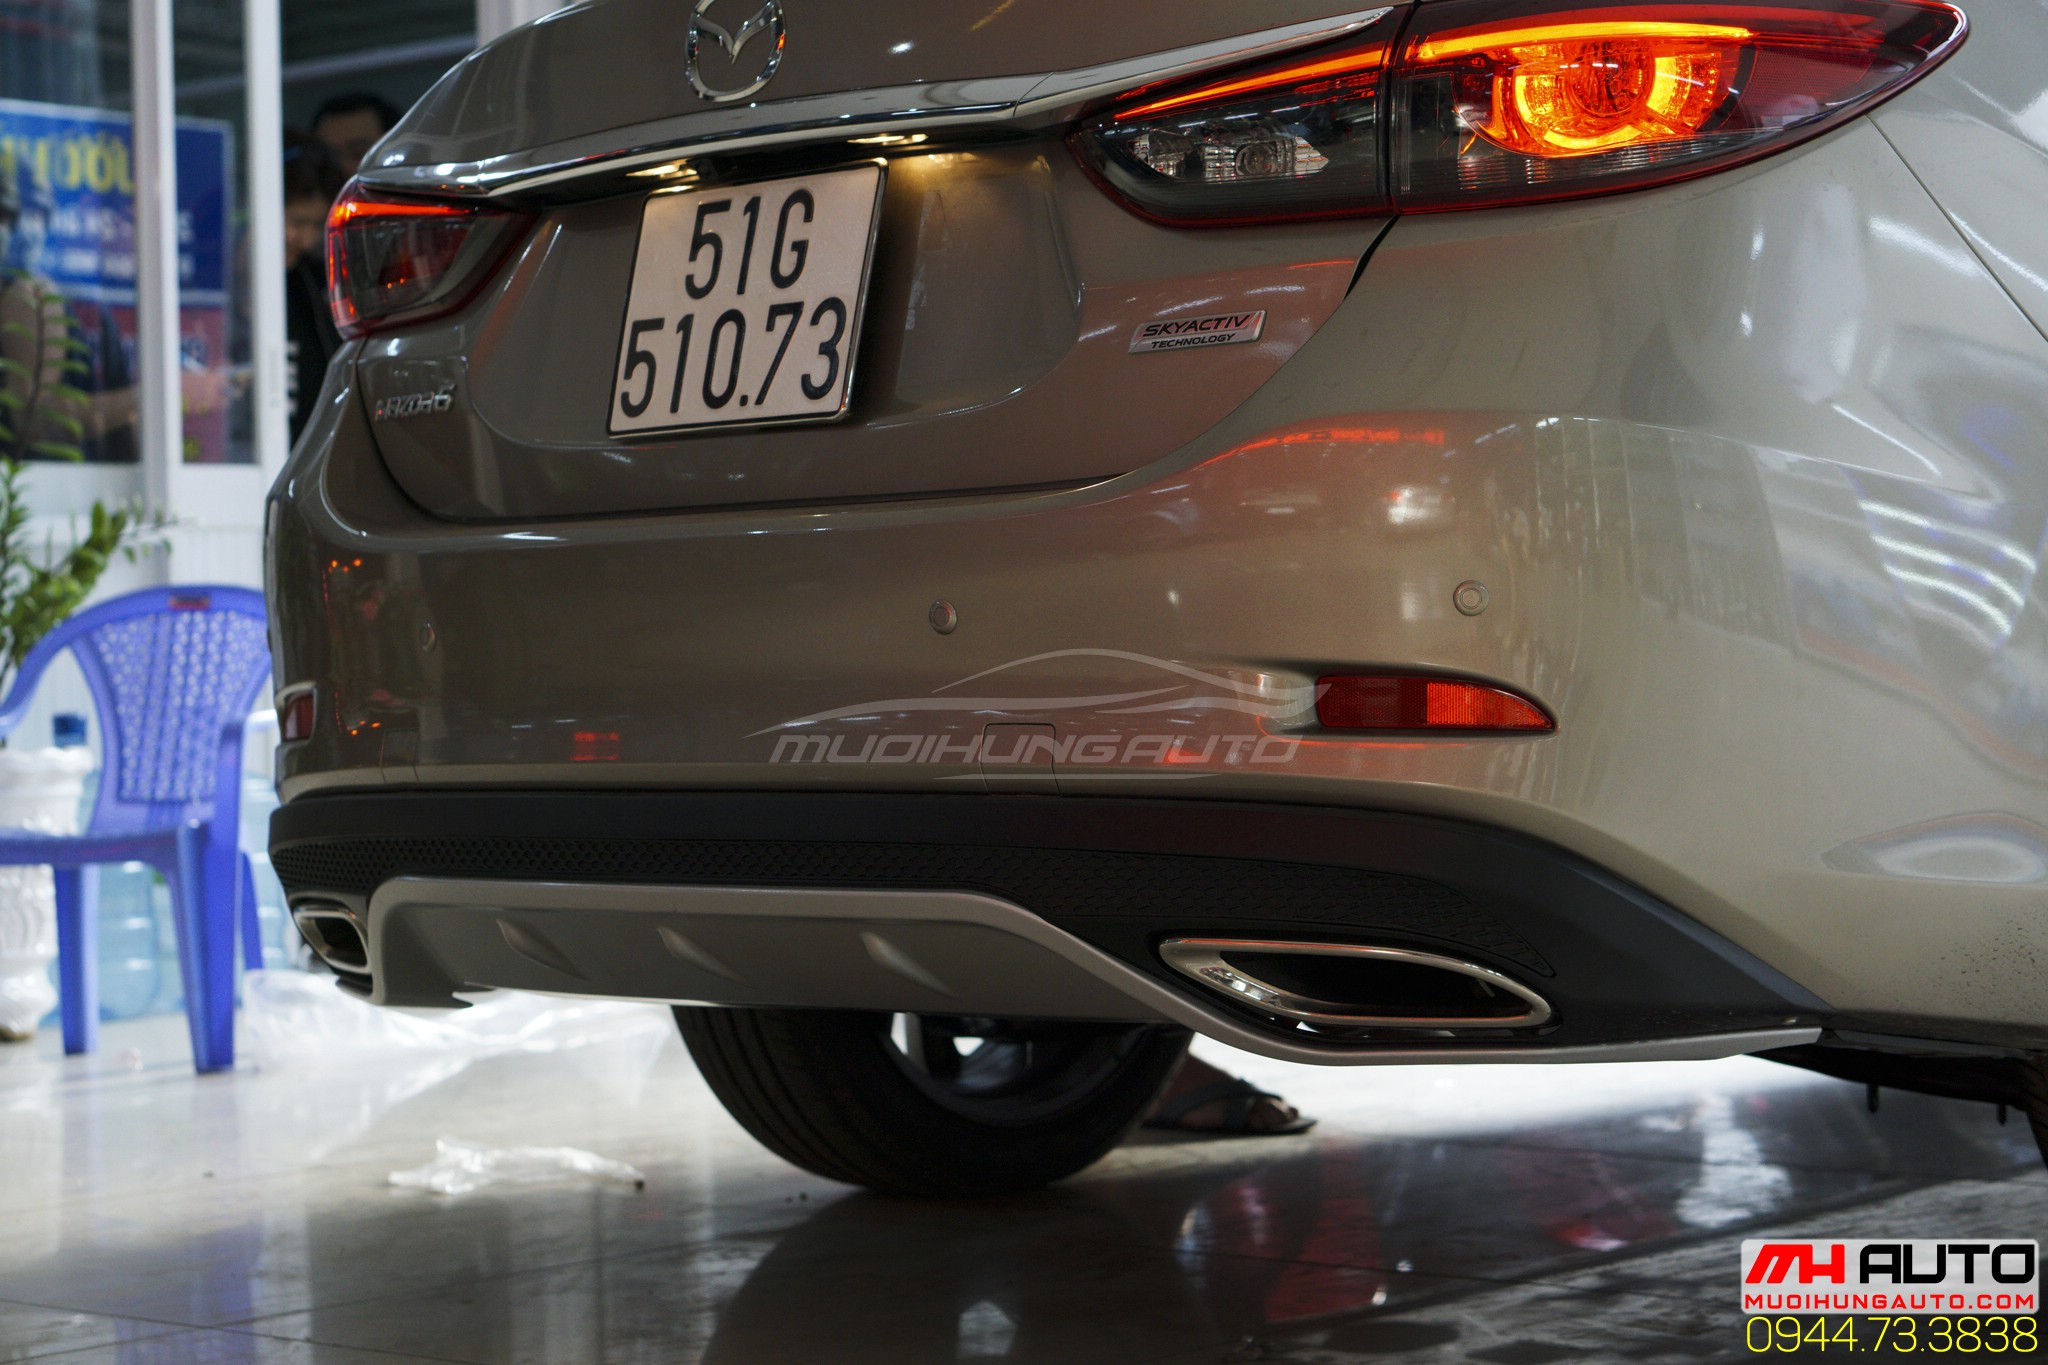 Độ líp pô Mazda 6 đẹp